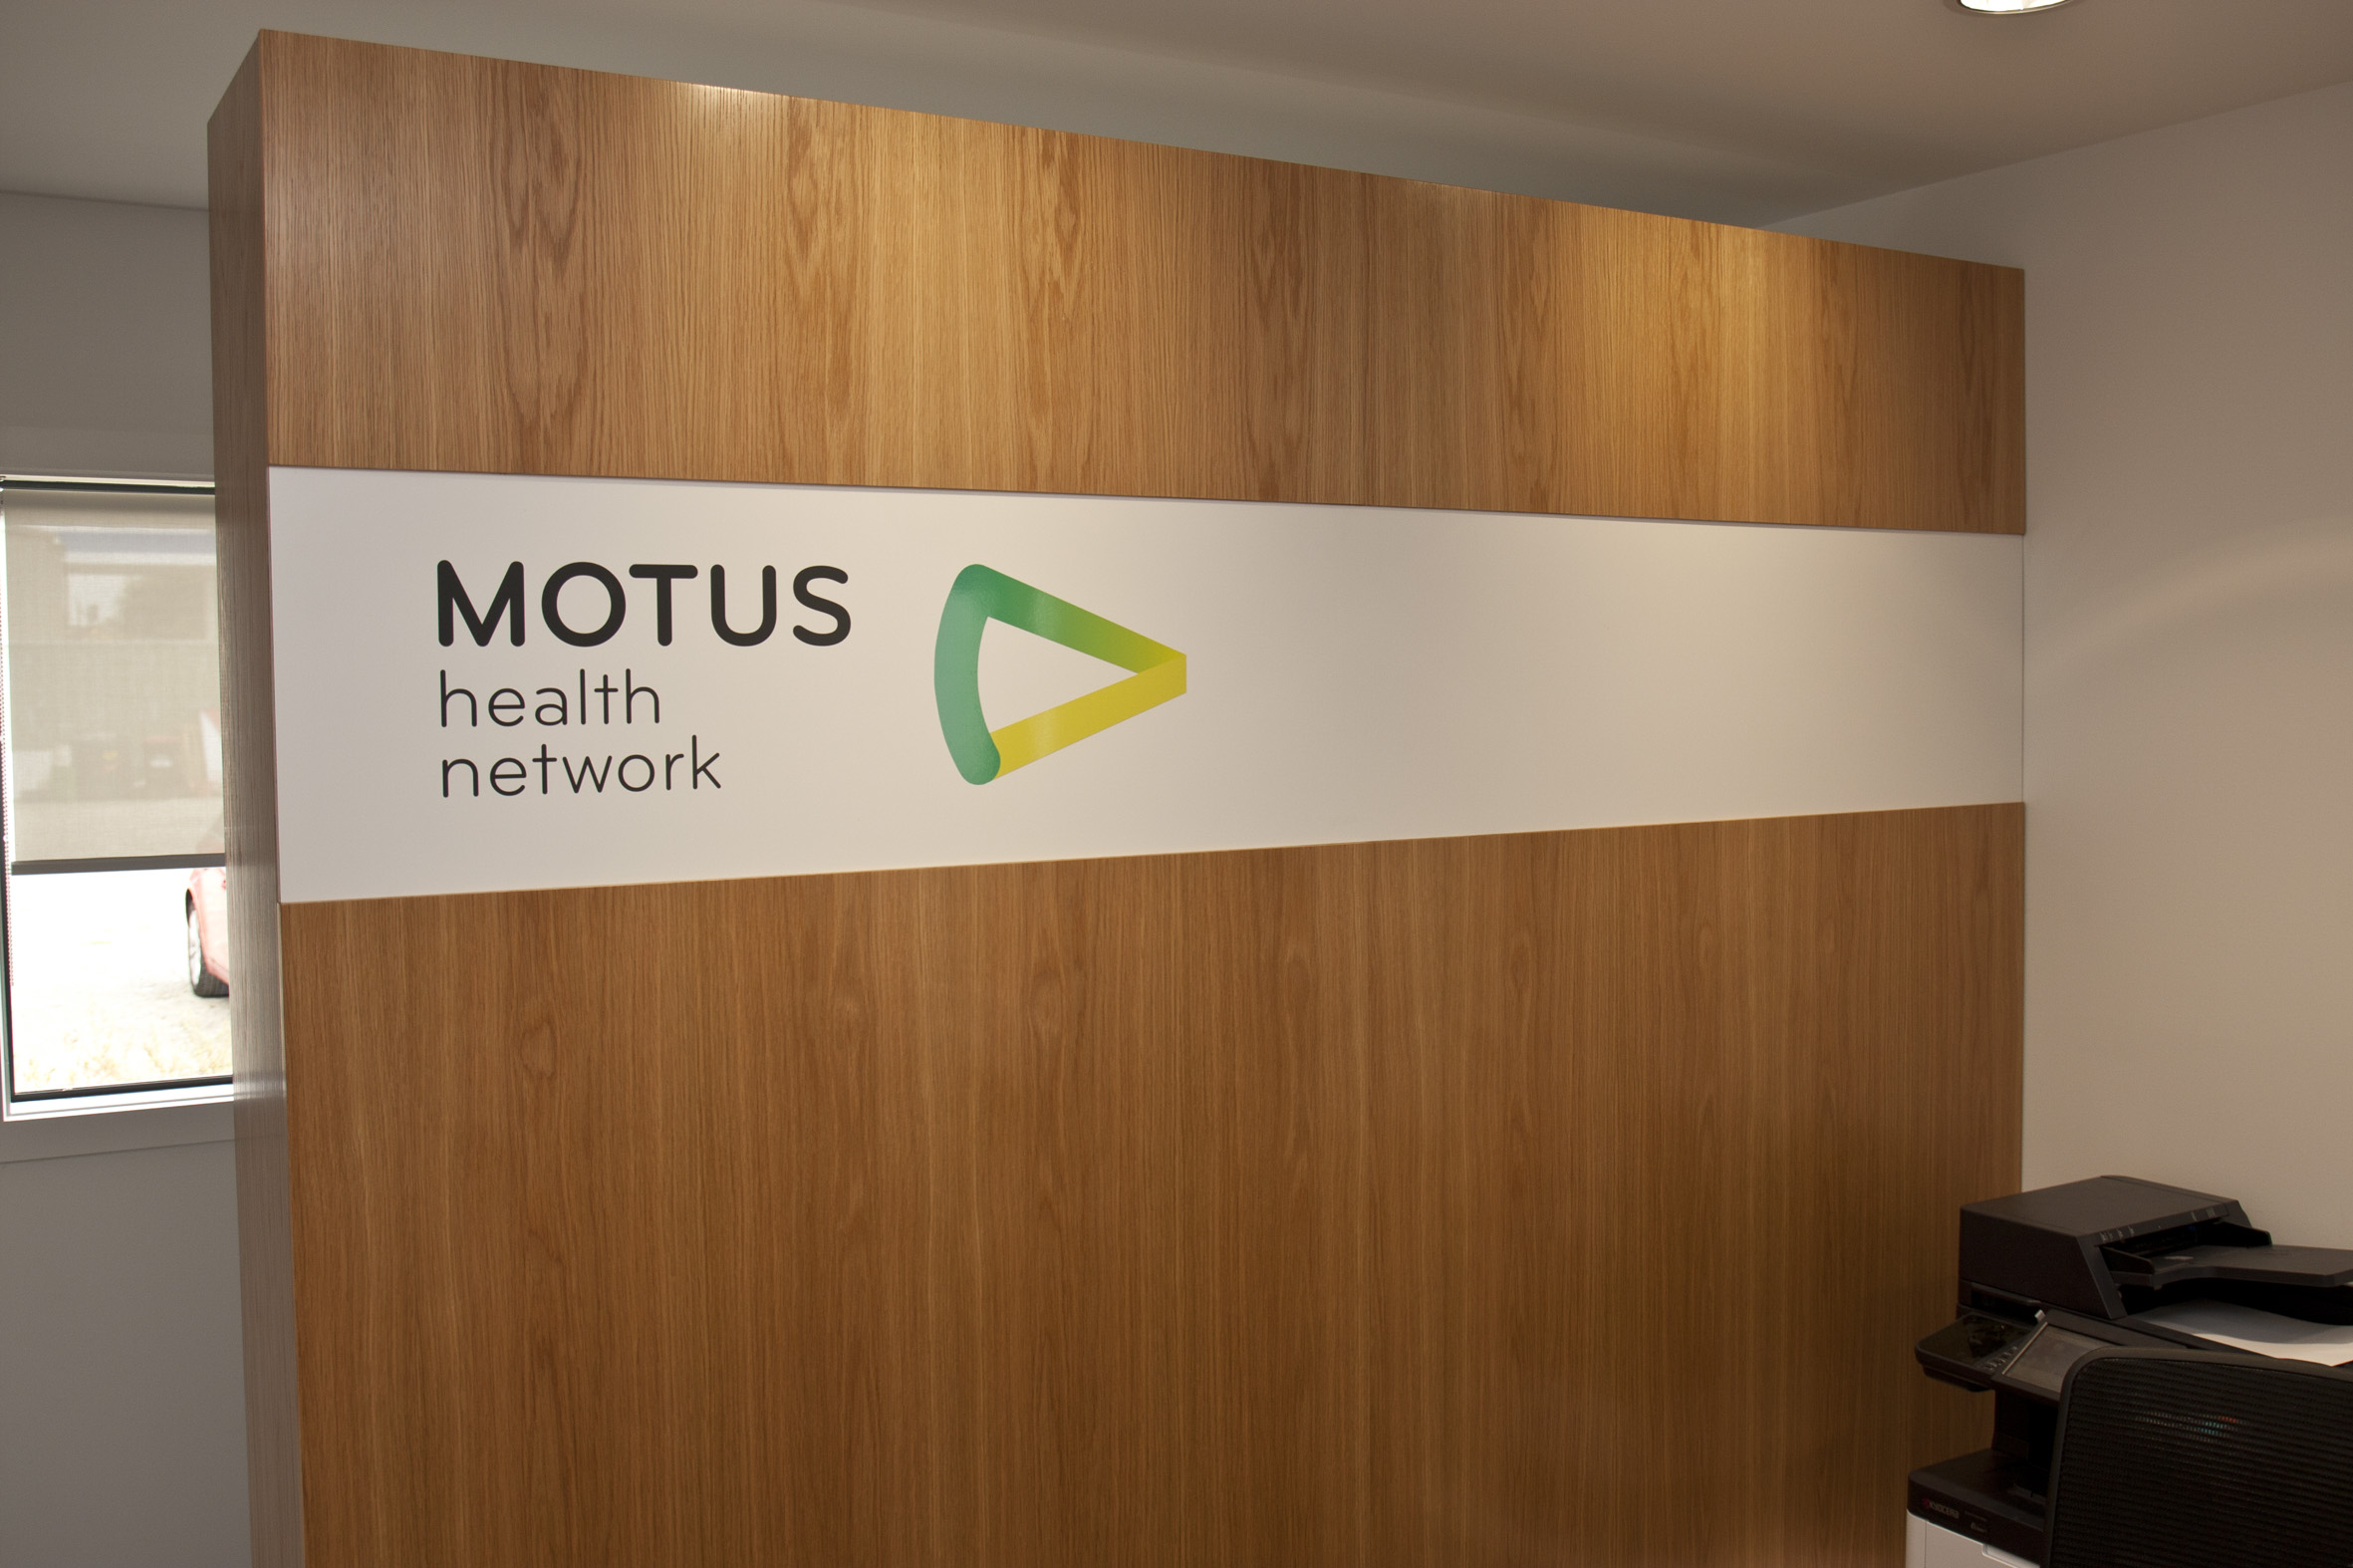 MOTUS Logo wall